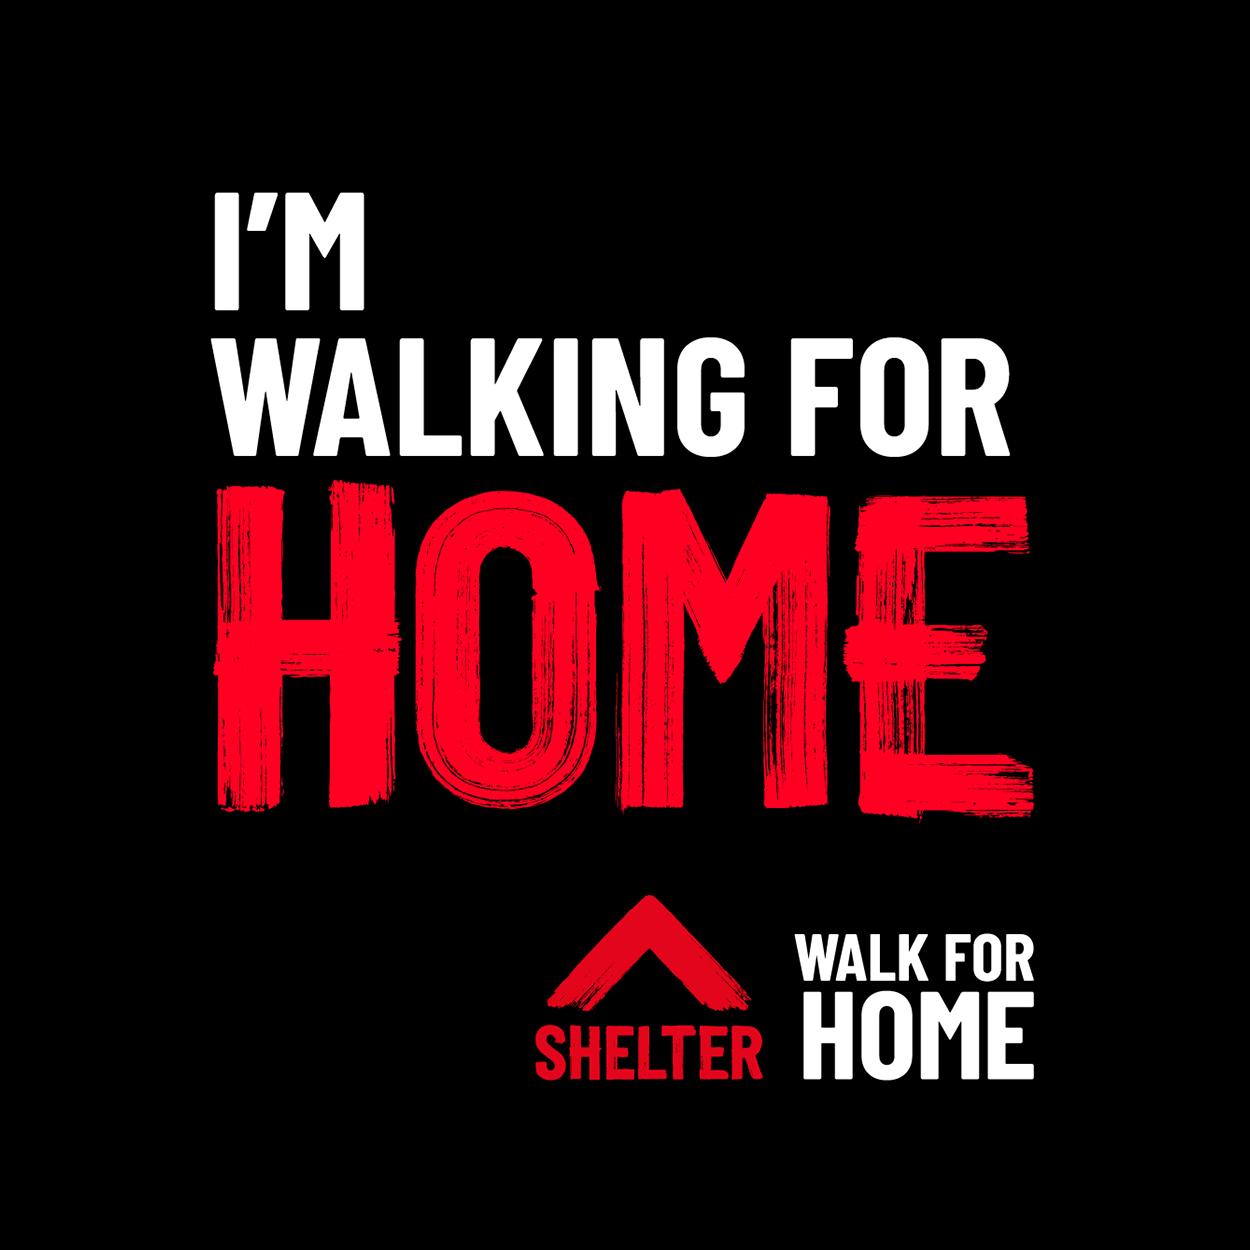 'I'm walking for home' Instagram tile